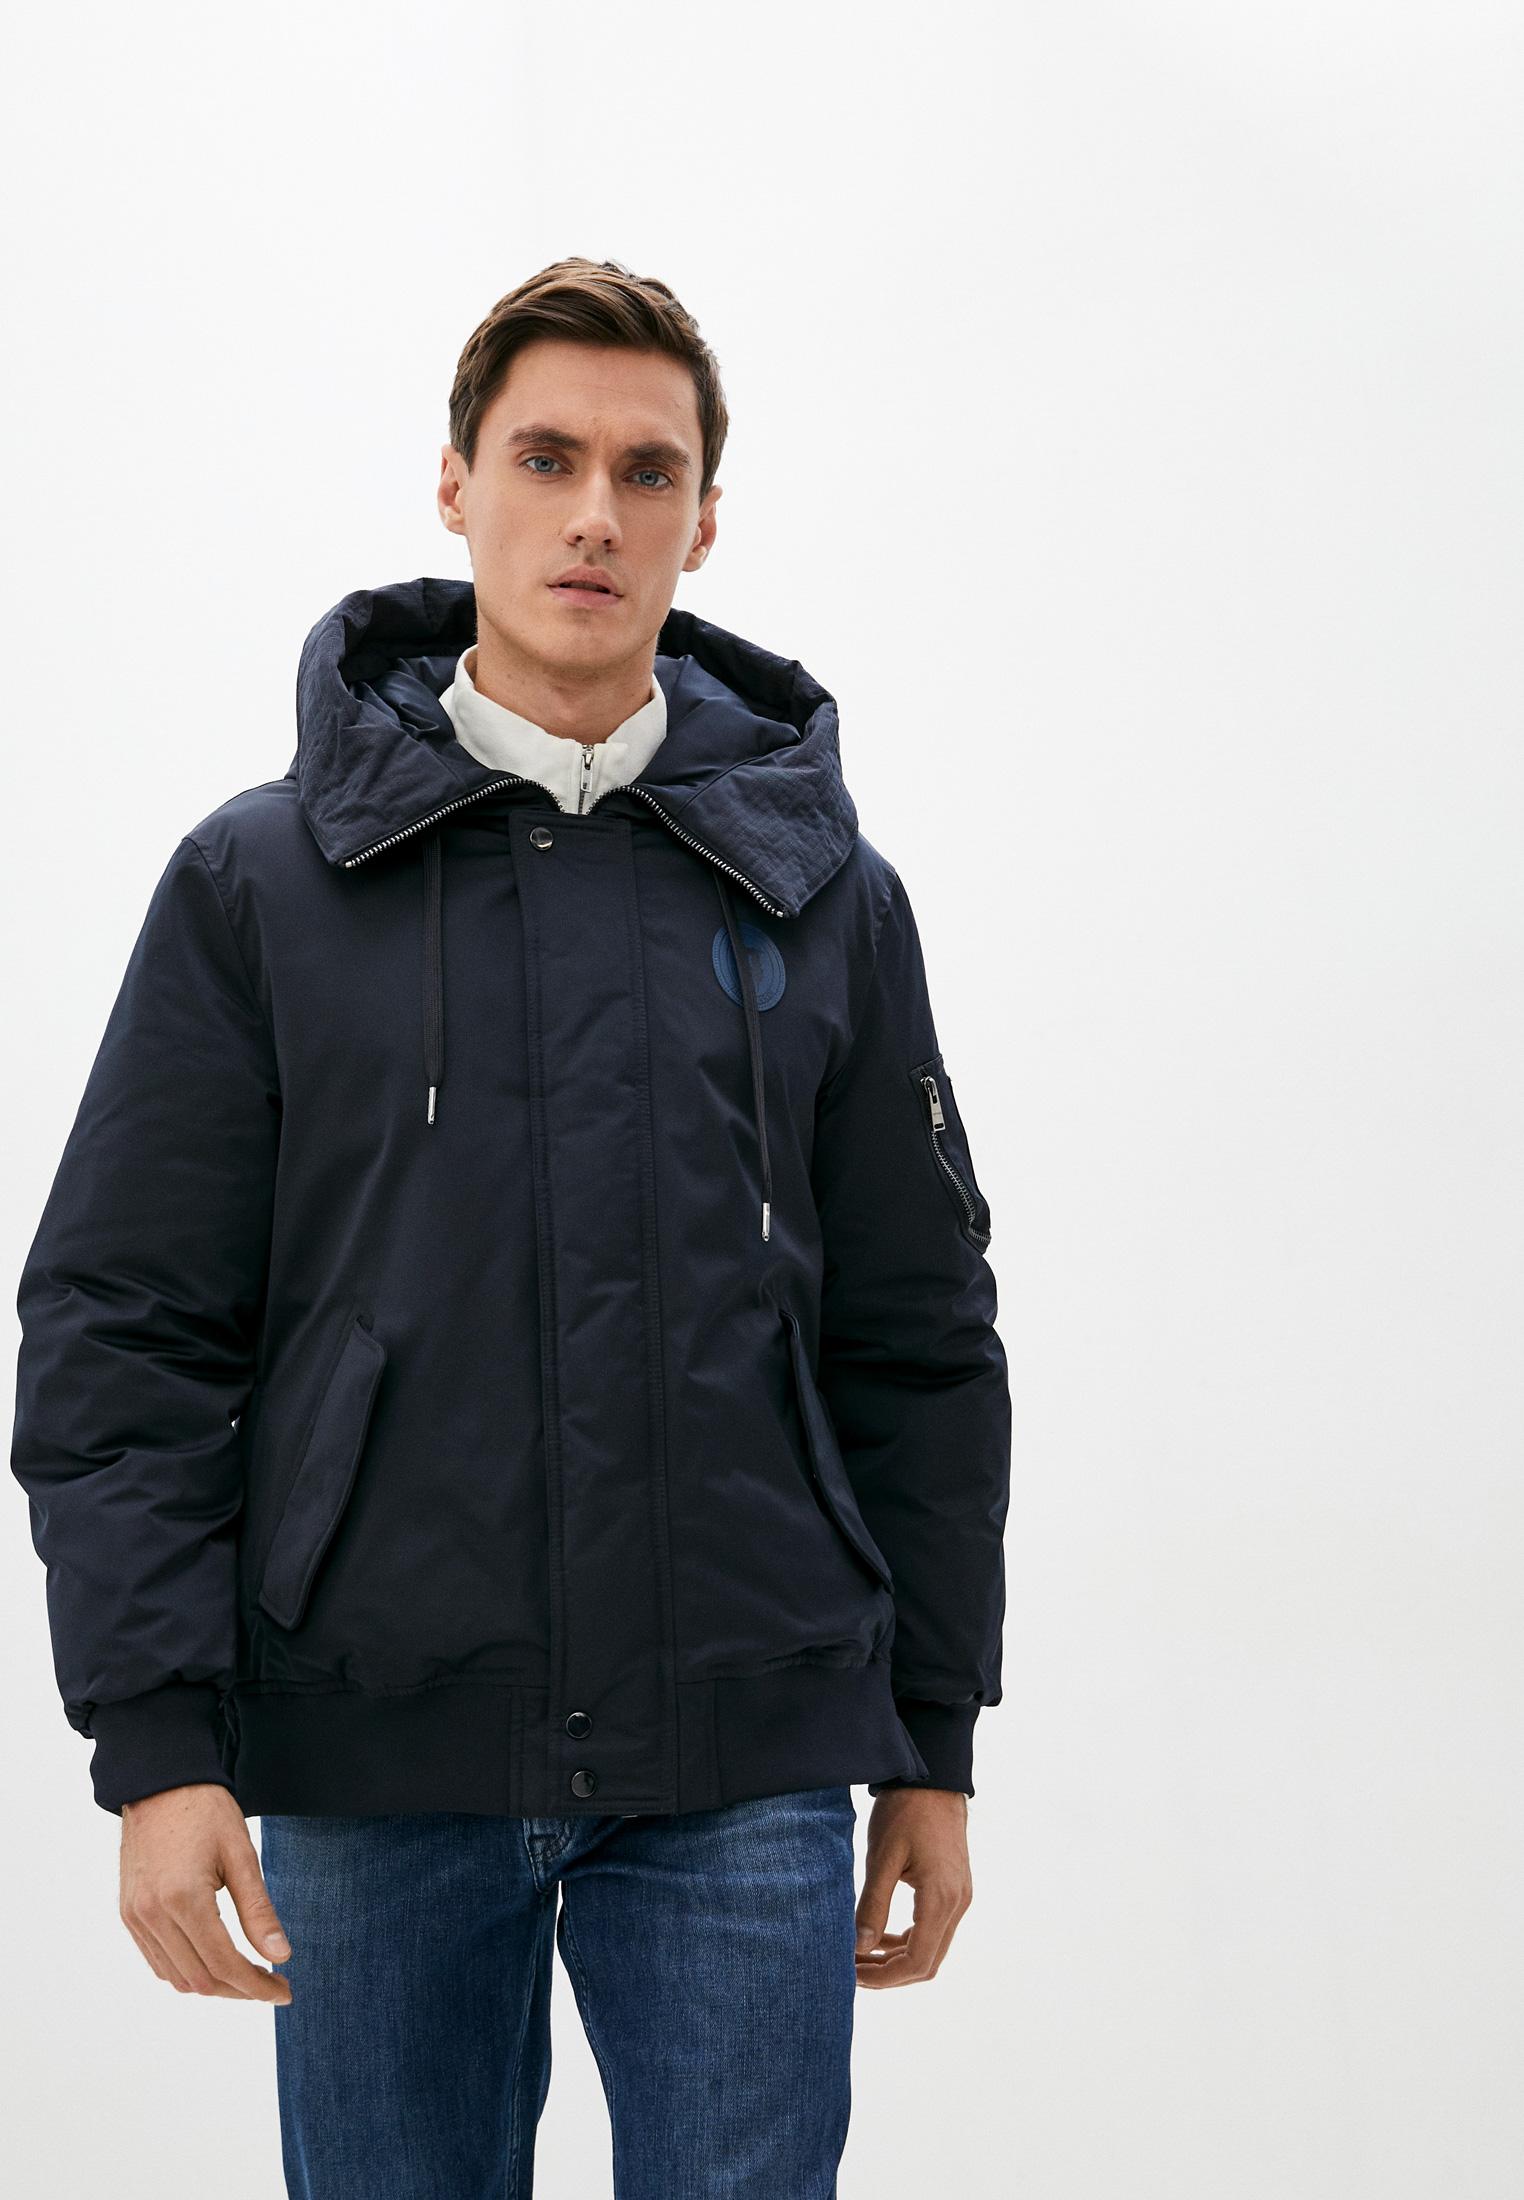 Куртка Trussardi (Труссарди) Куртка утепленная Trussardi